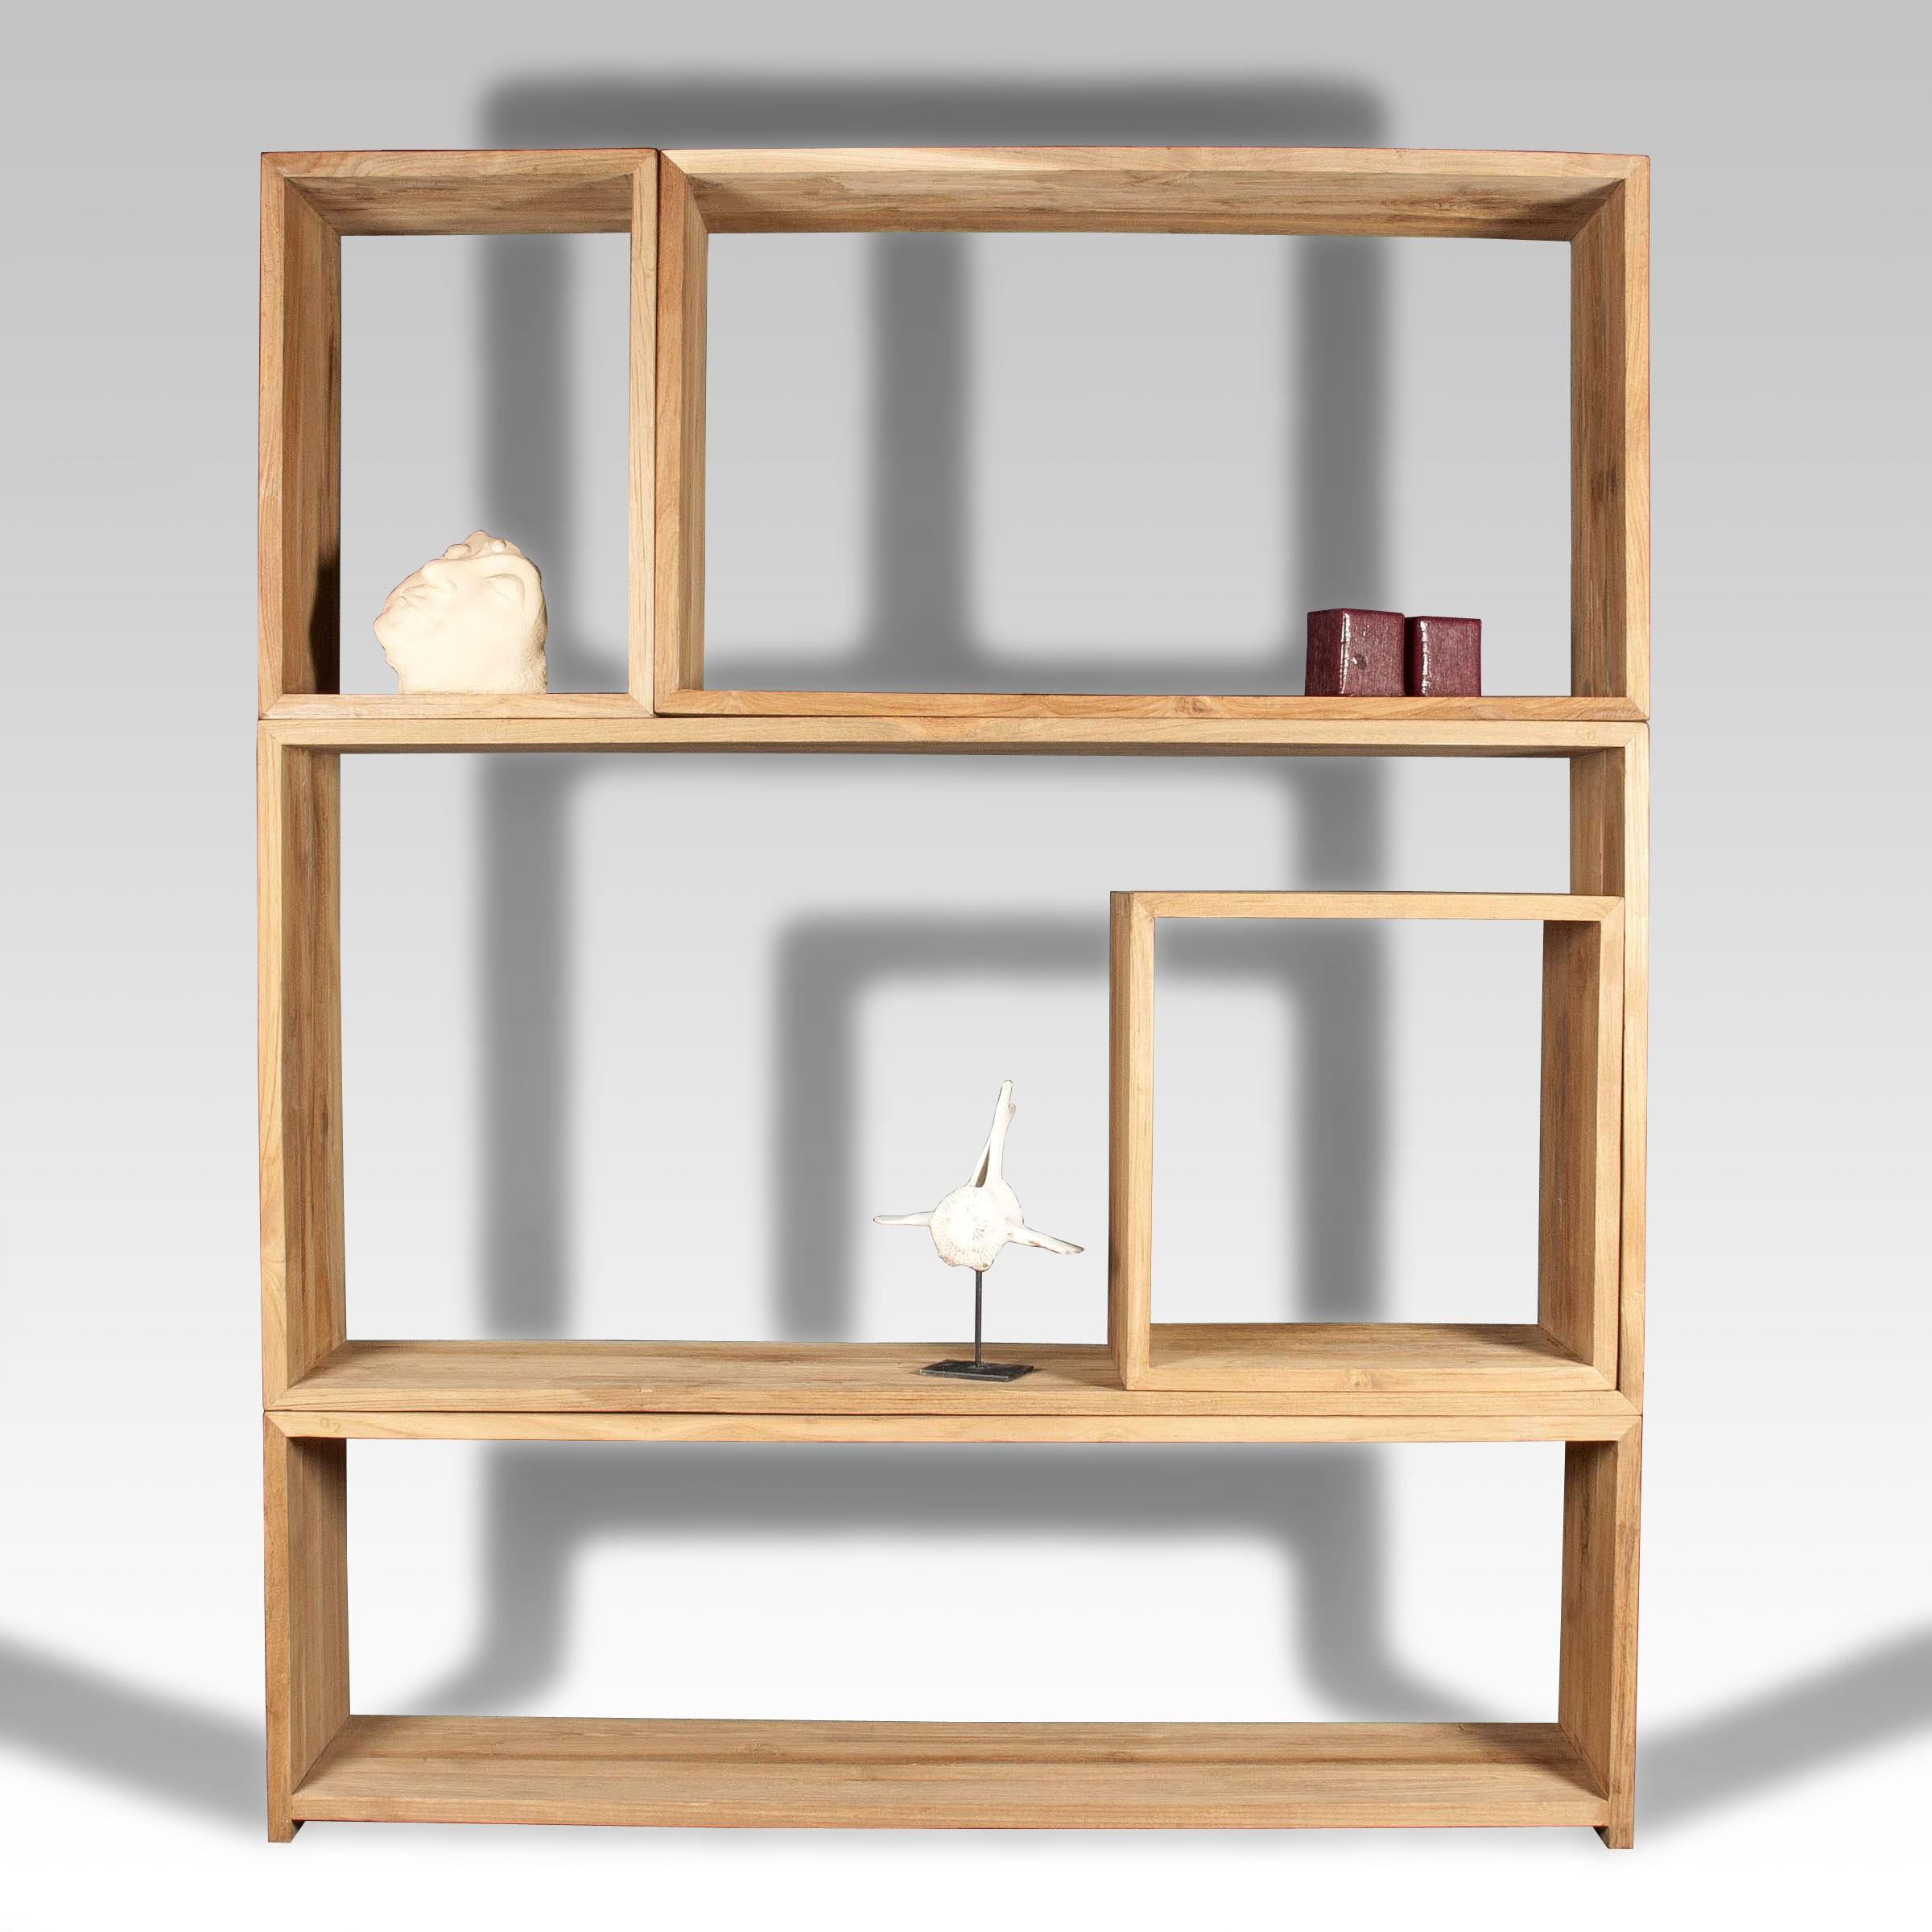 Ikea estanteria madera